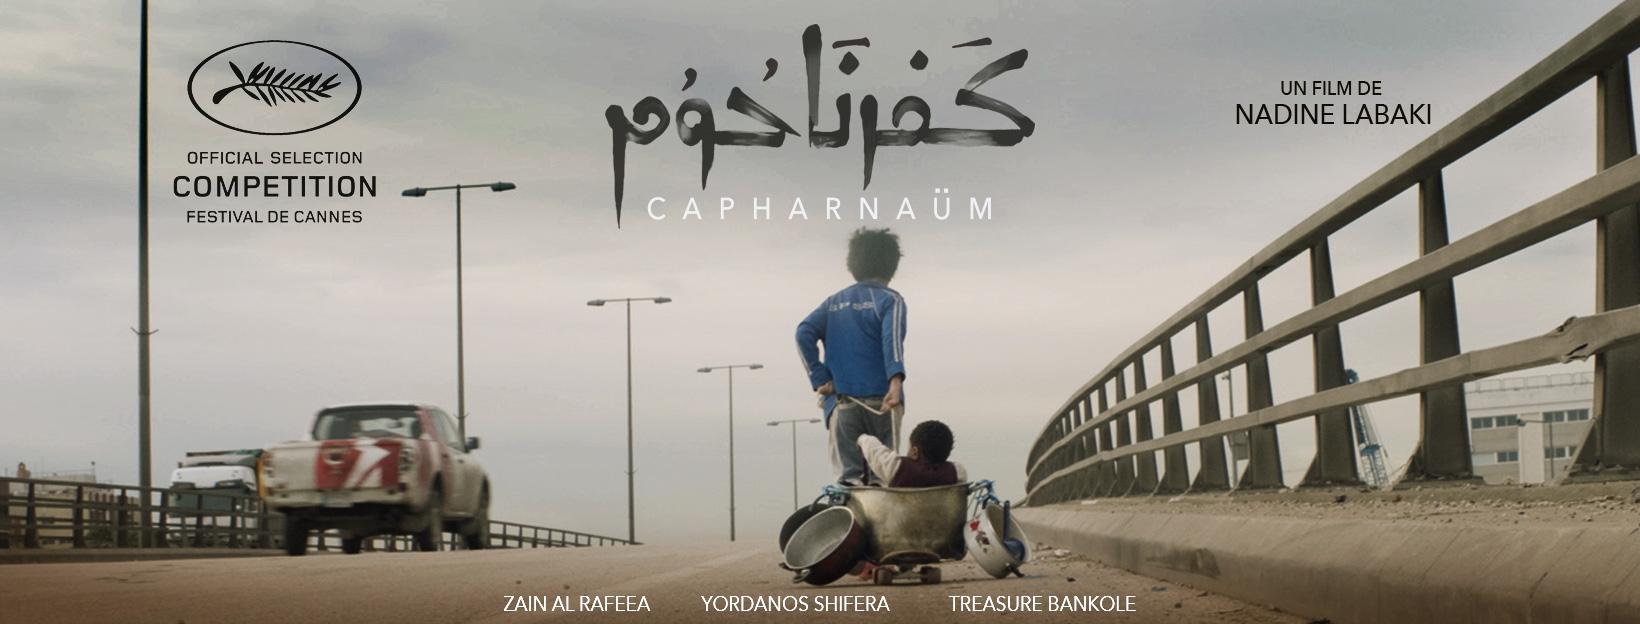 Image-Facebook-du-compte-officielle-du-film-Capharnaum-de-Nadine-Labaki